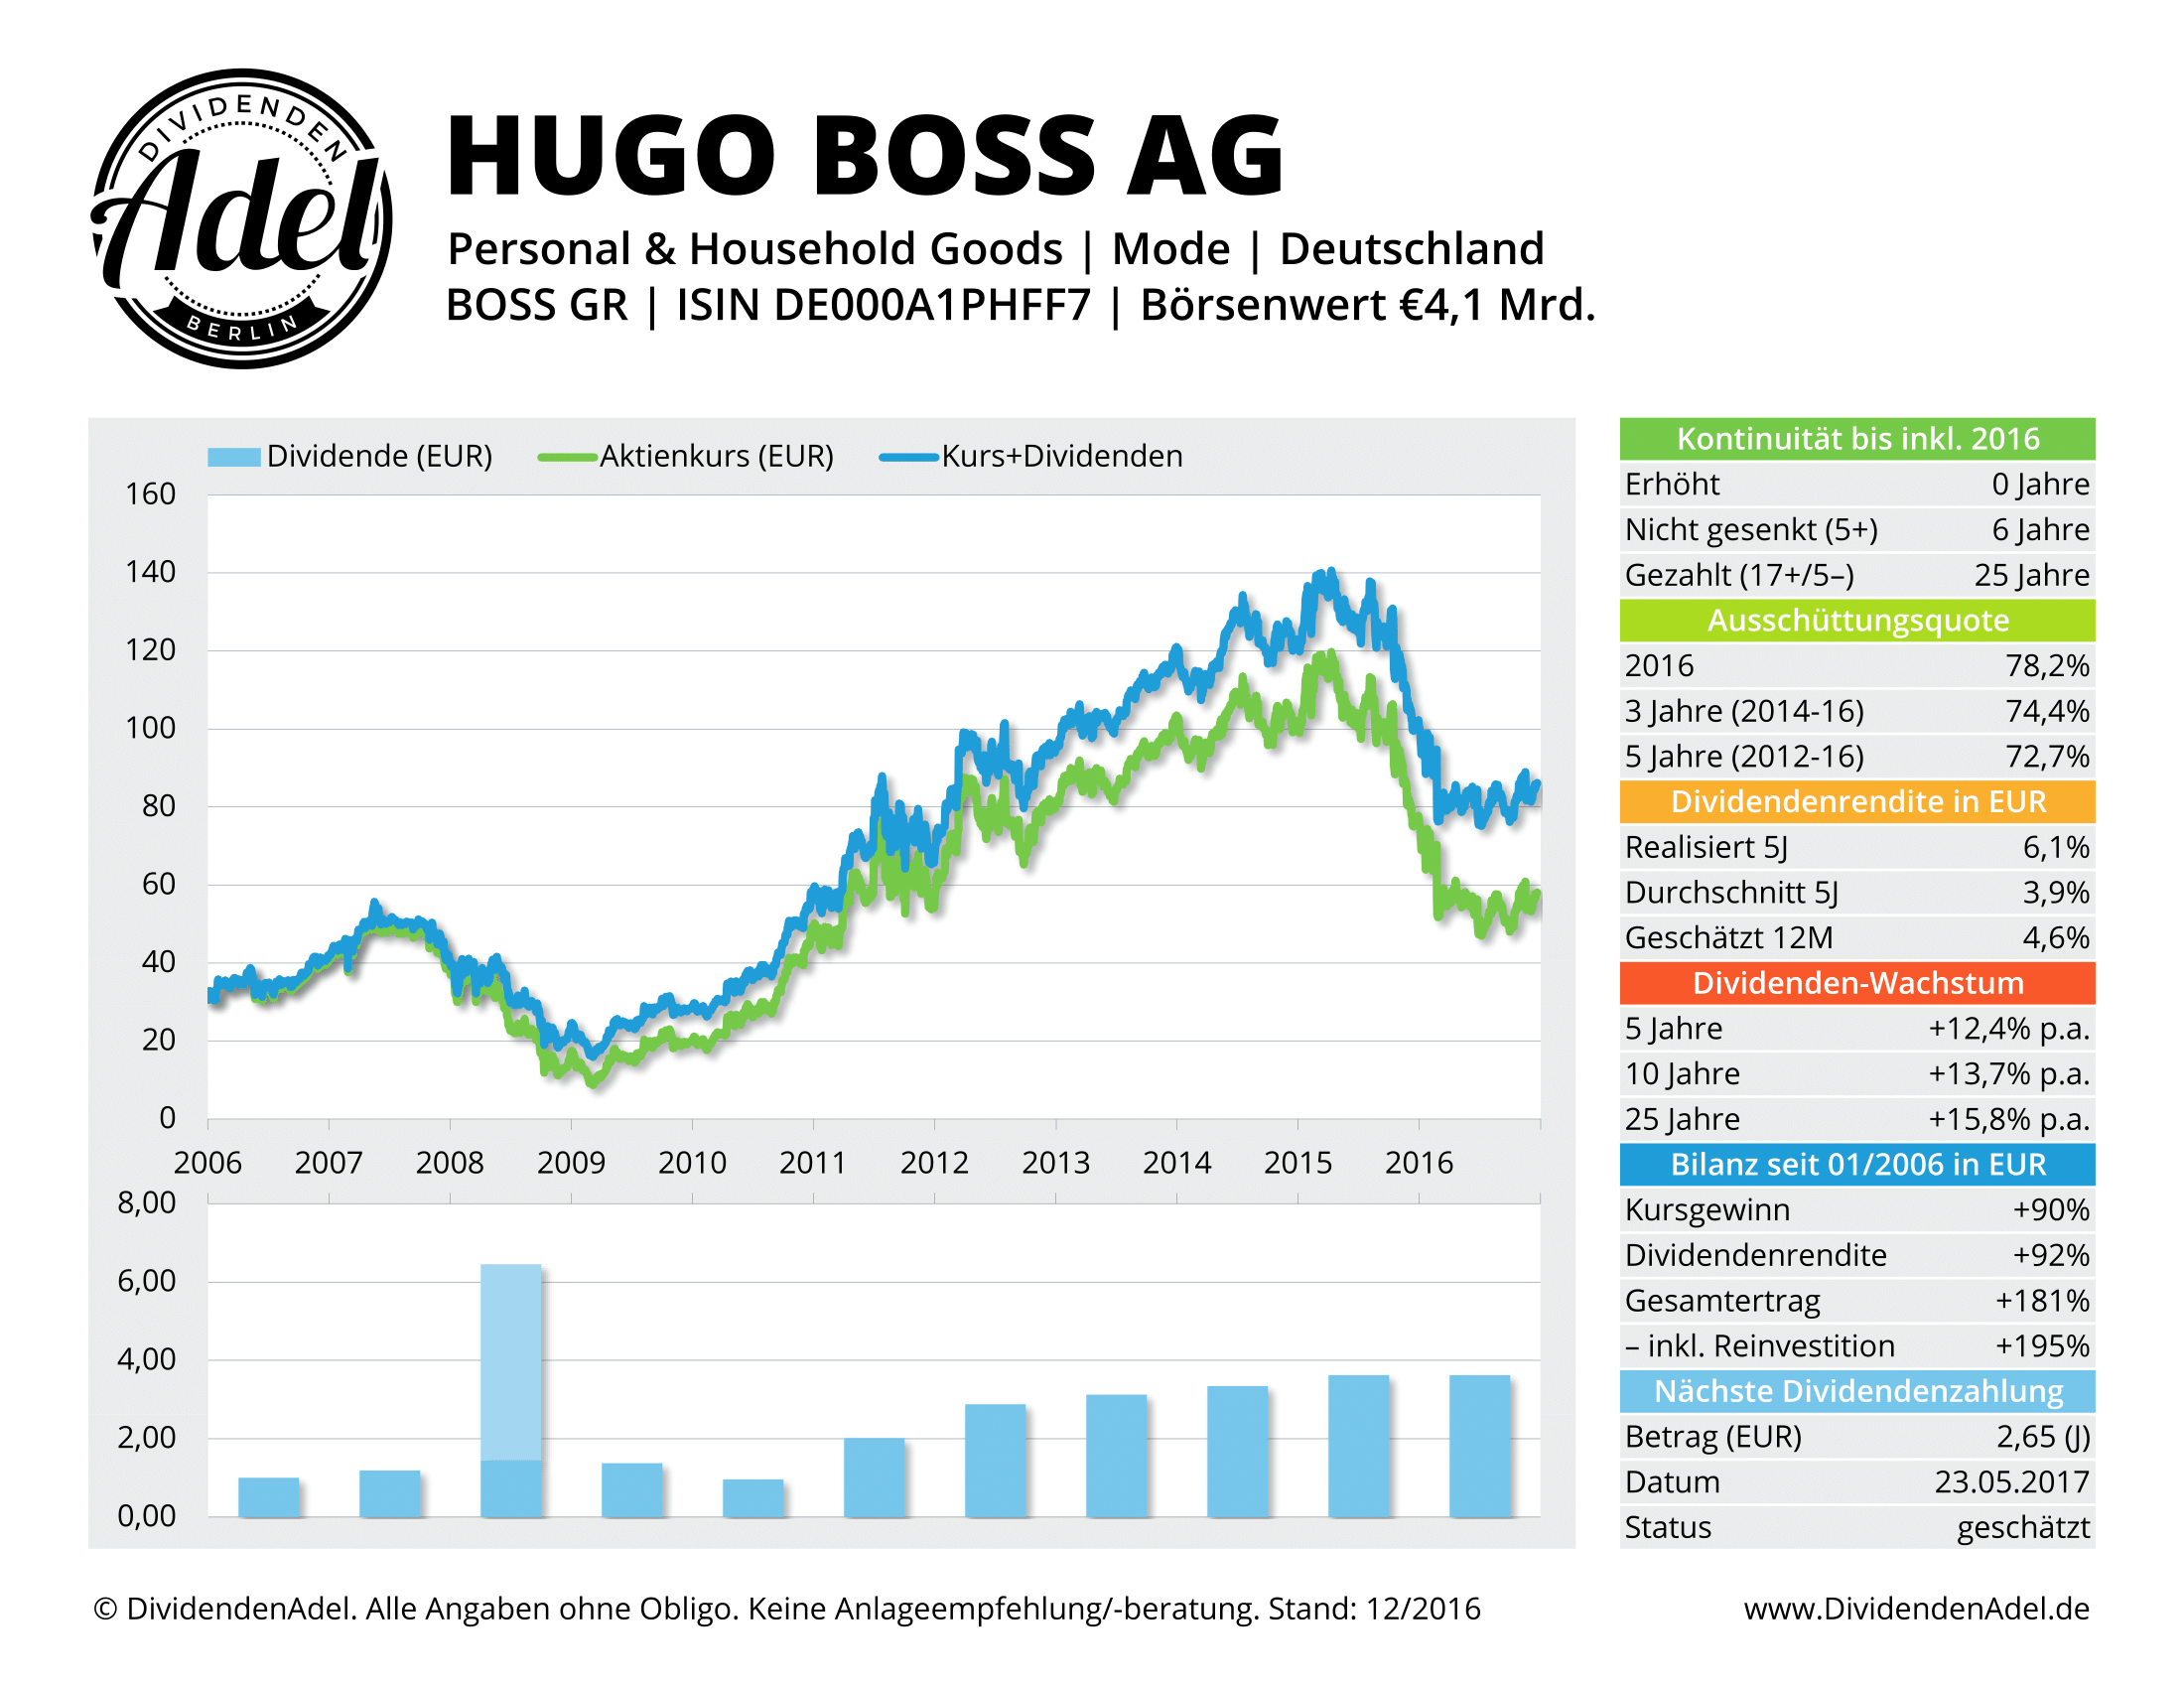 DividendenAdel Dividendenprofil Hugo Boss